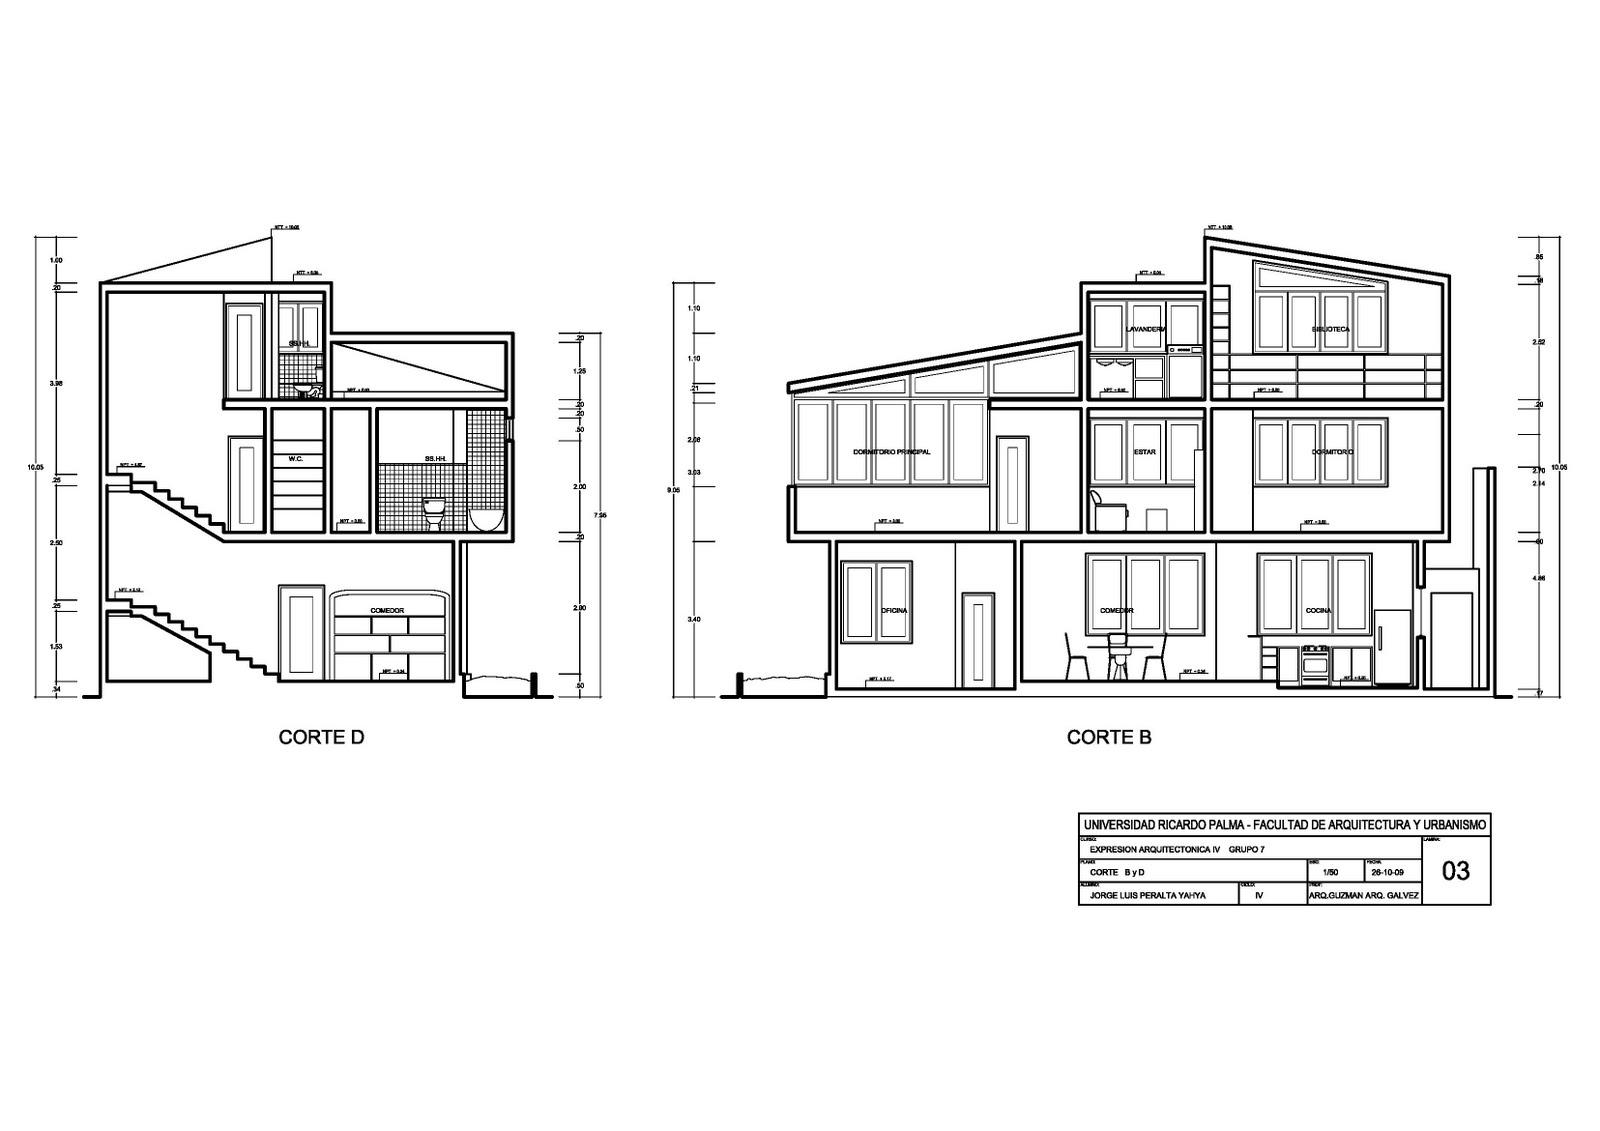 Expresi n arquitect nica 4 planos de arquitectura for Planos arquitectonicos vivienda